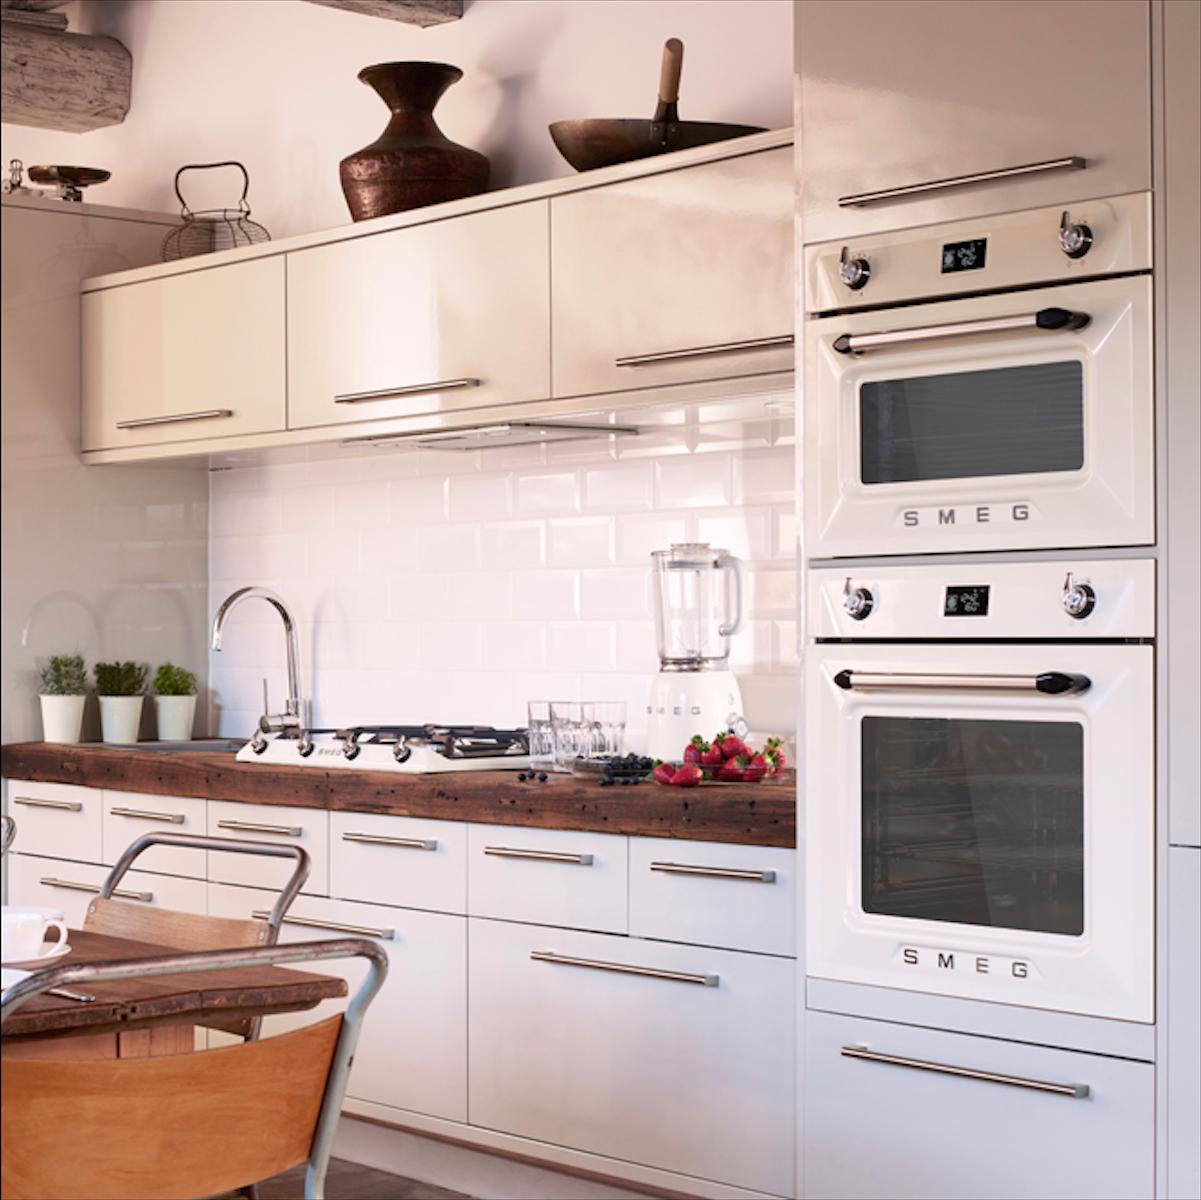 Kitchen Designs Victoria: Victoria Oven With Pyrolitic